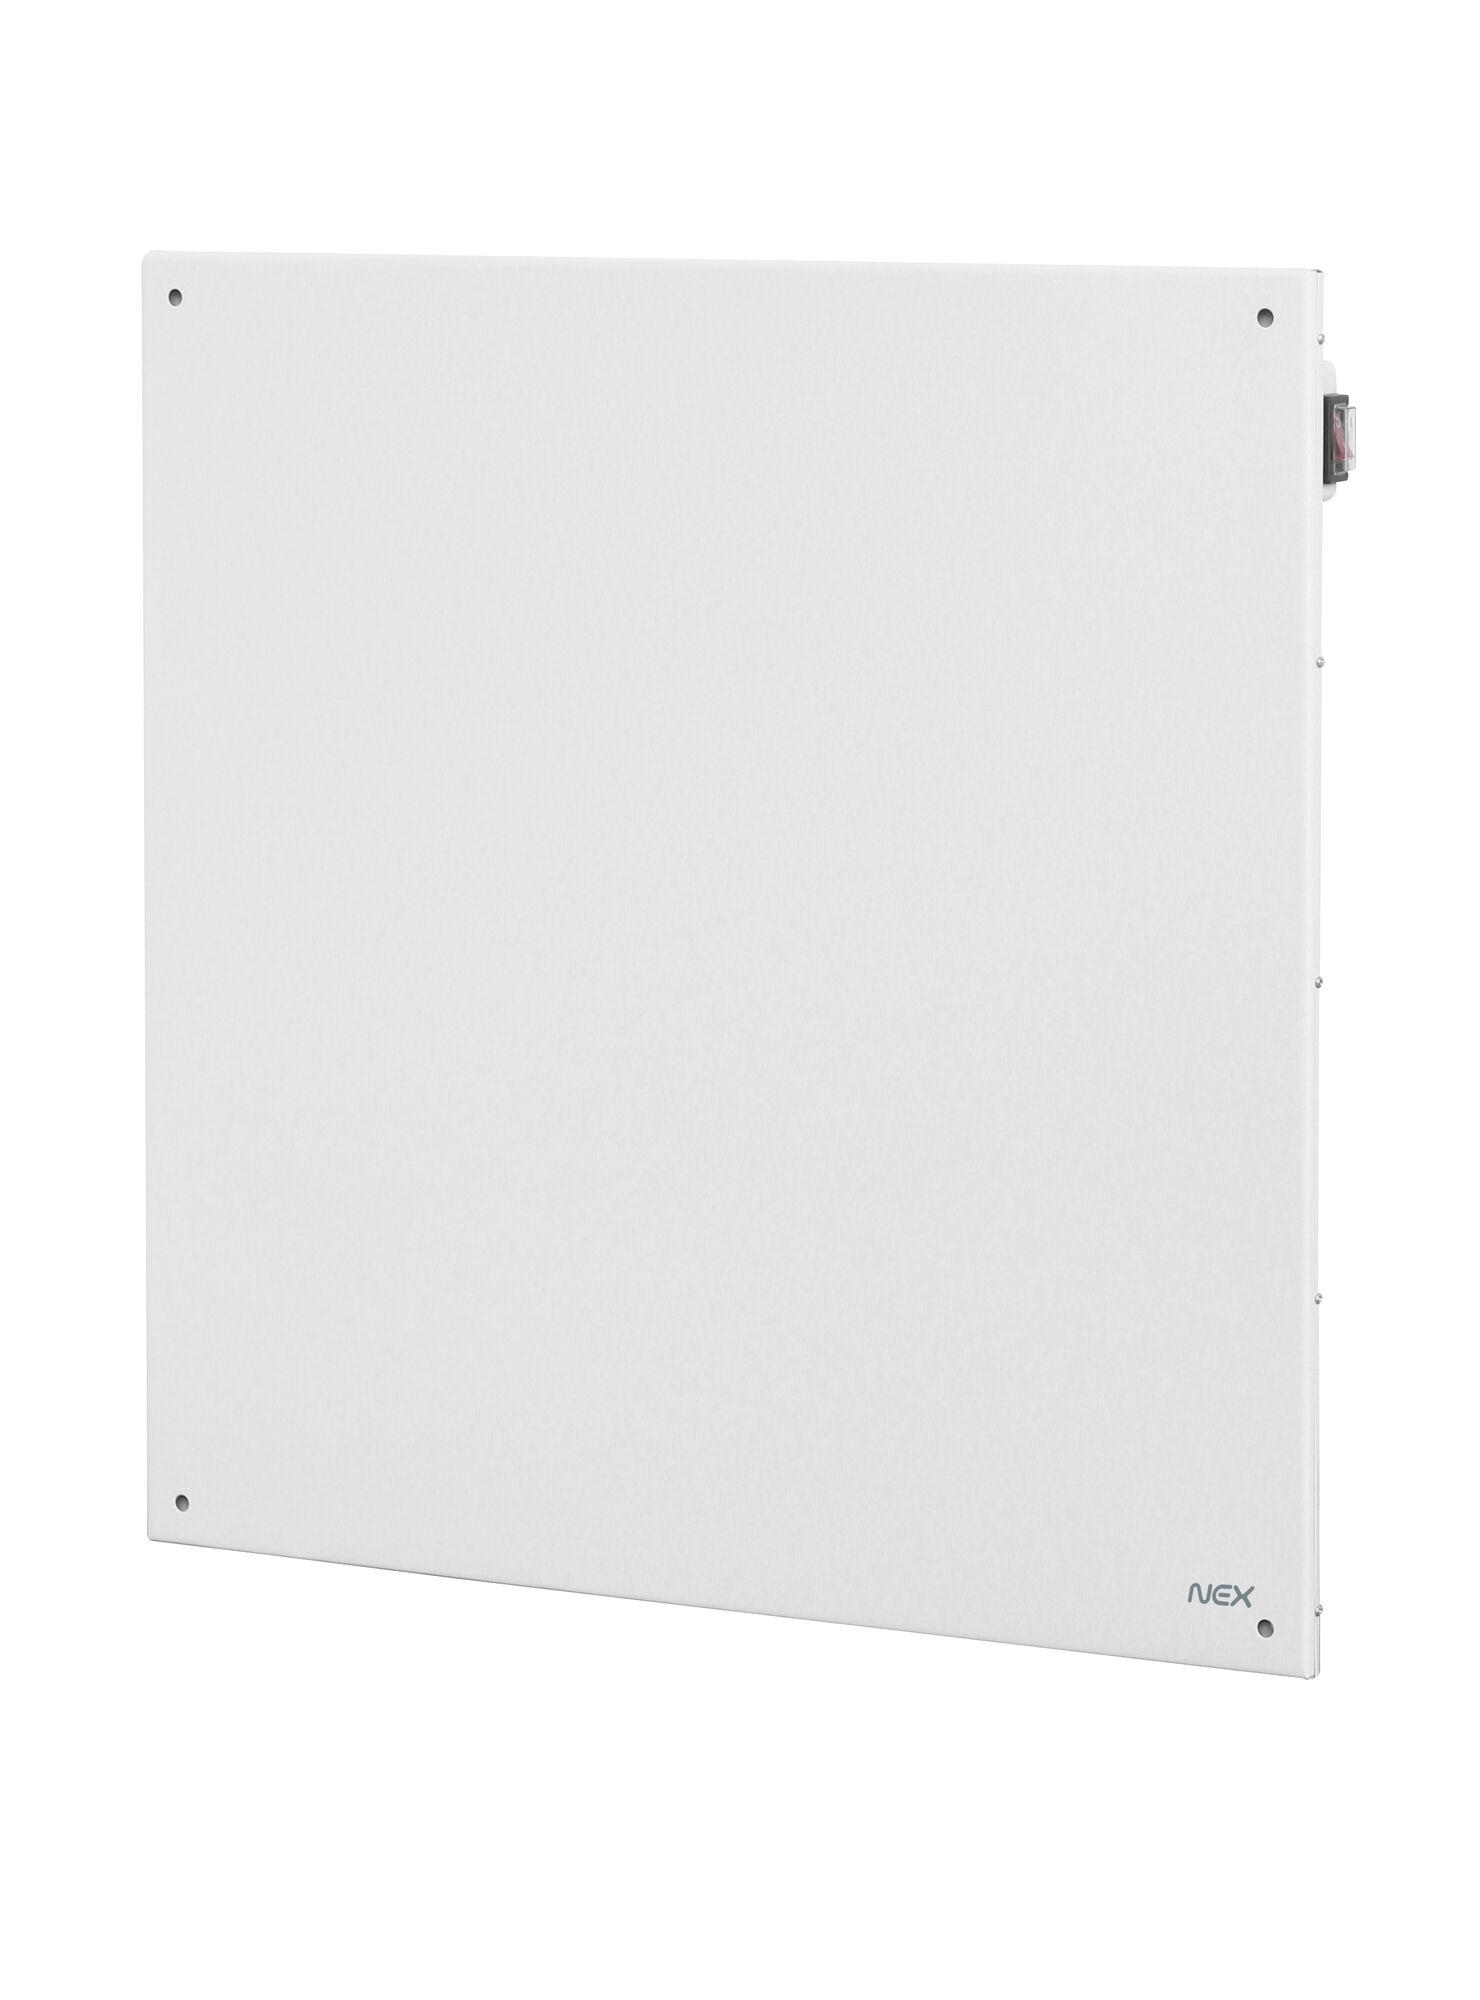 Panel Eléctrico Nex PH002 400W